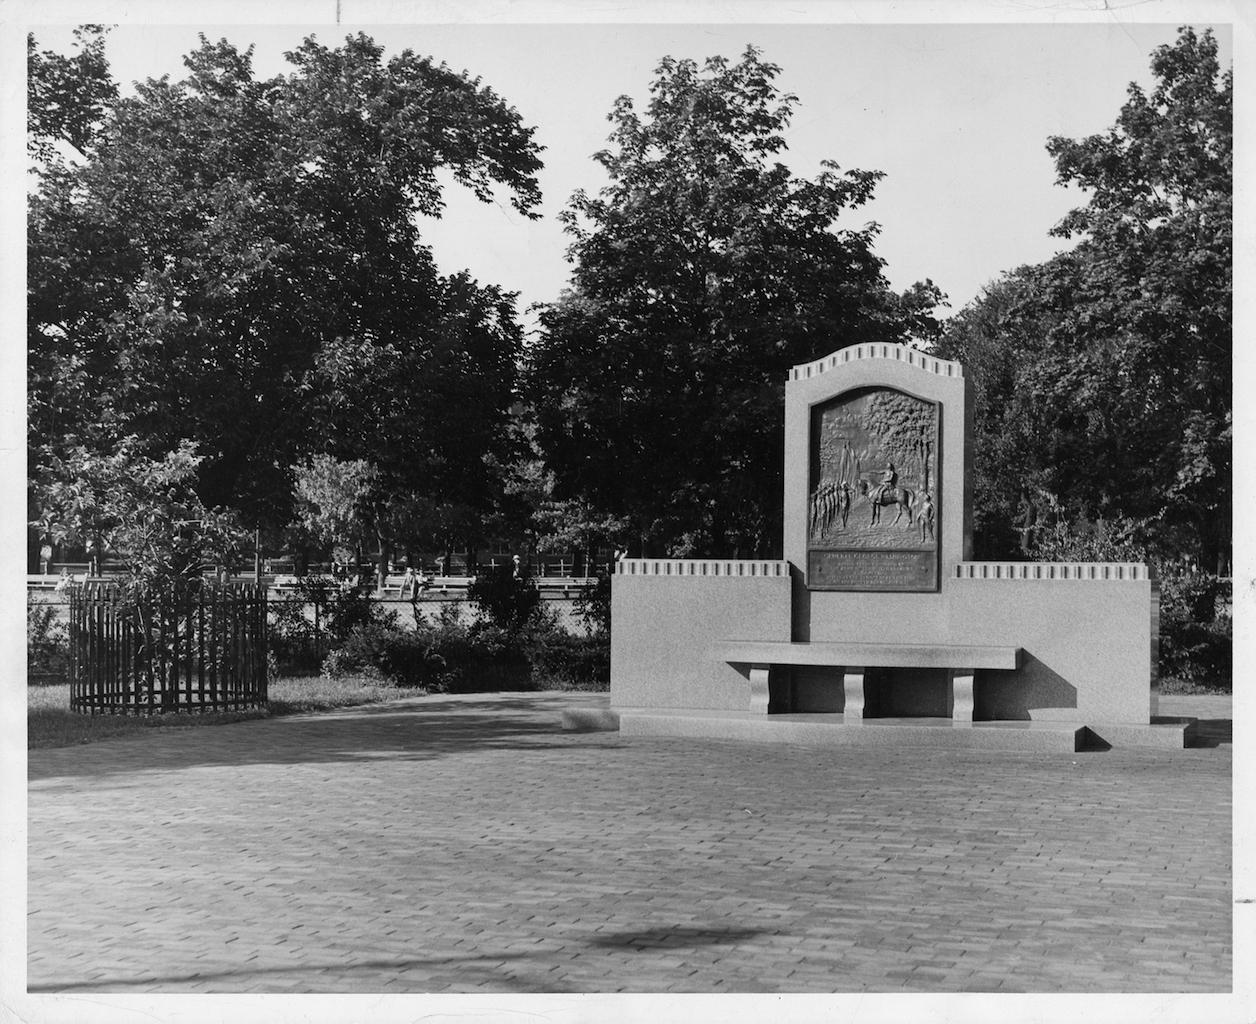 Washington Monument Memorial on Cambridge Common